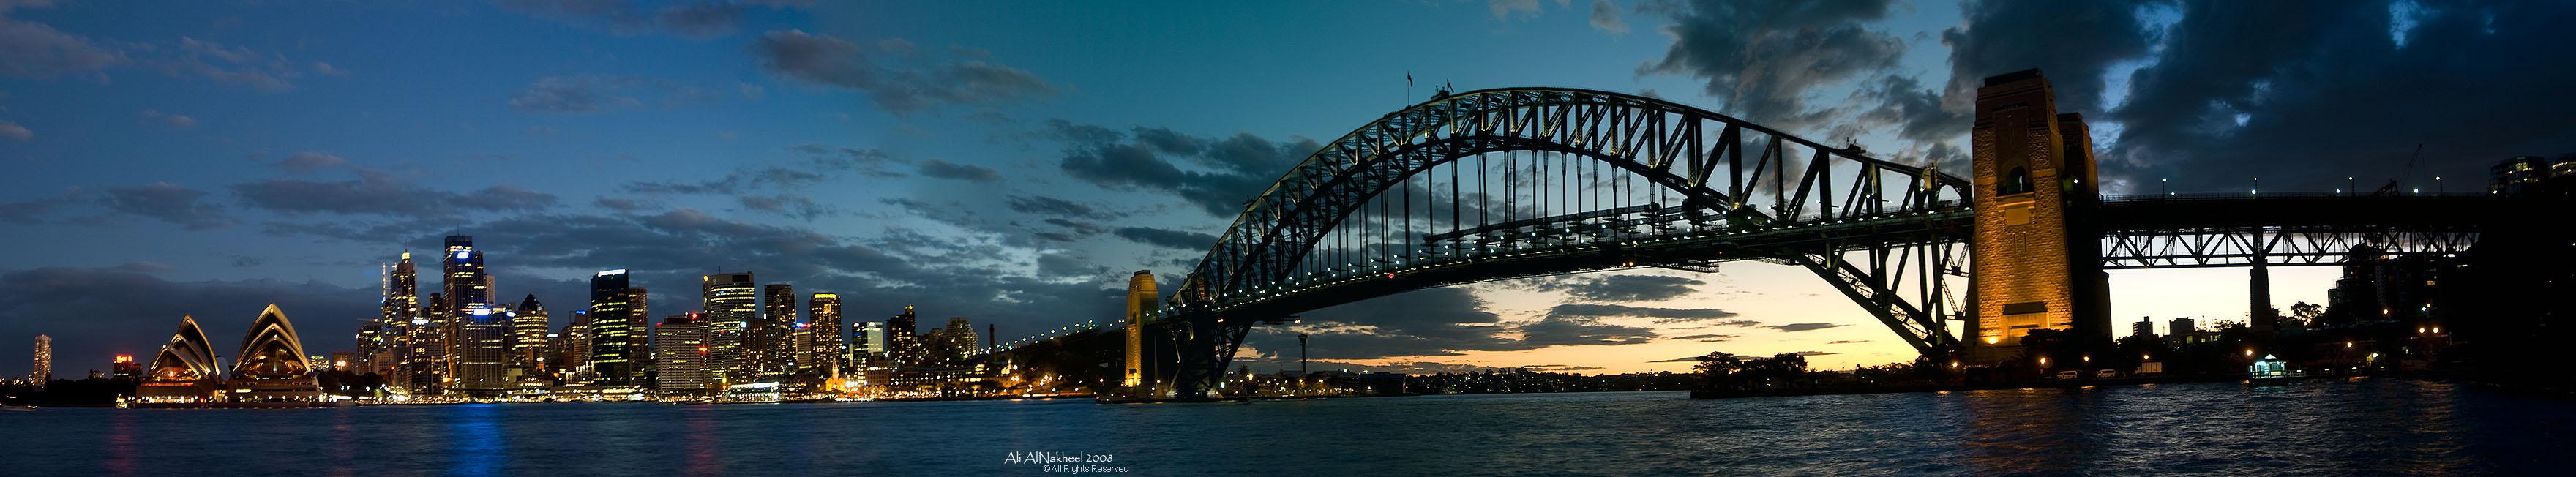 Panorama of Sydney Skyline III by IAMSORRY87